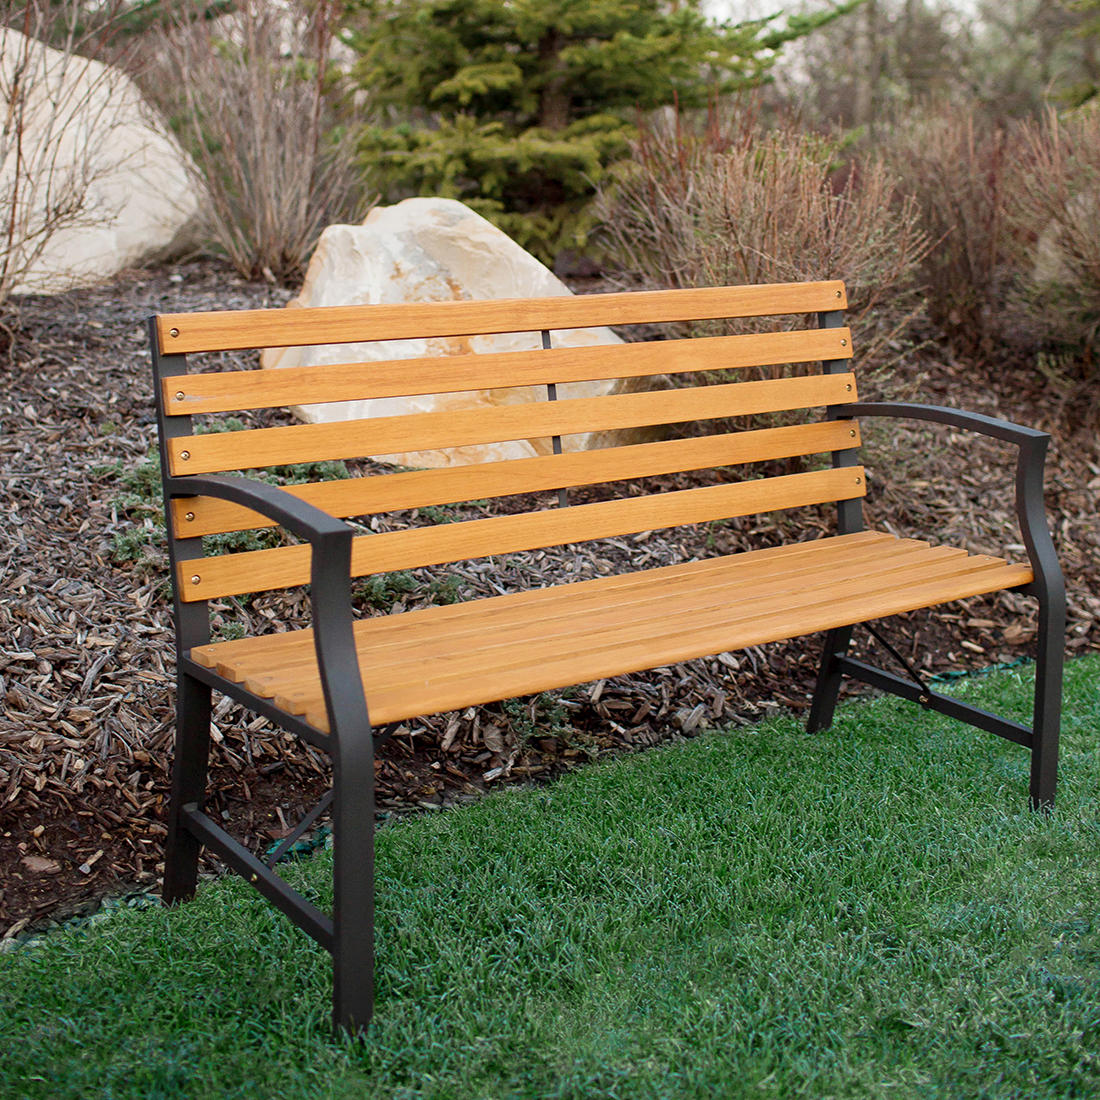 Fabulous W Trends Steel Outdoor Park Bench Black Creativecarmelina Interior Chair Design Creativecarmelinacom